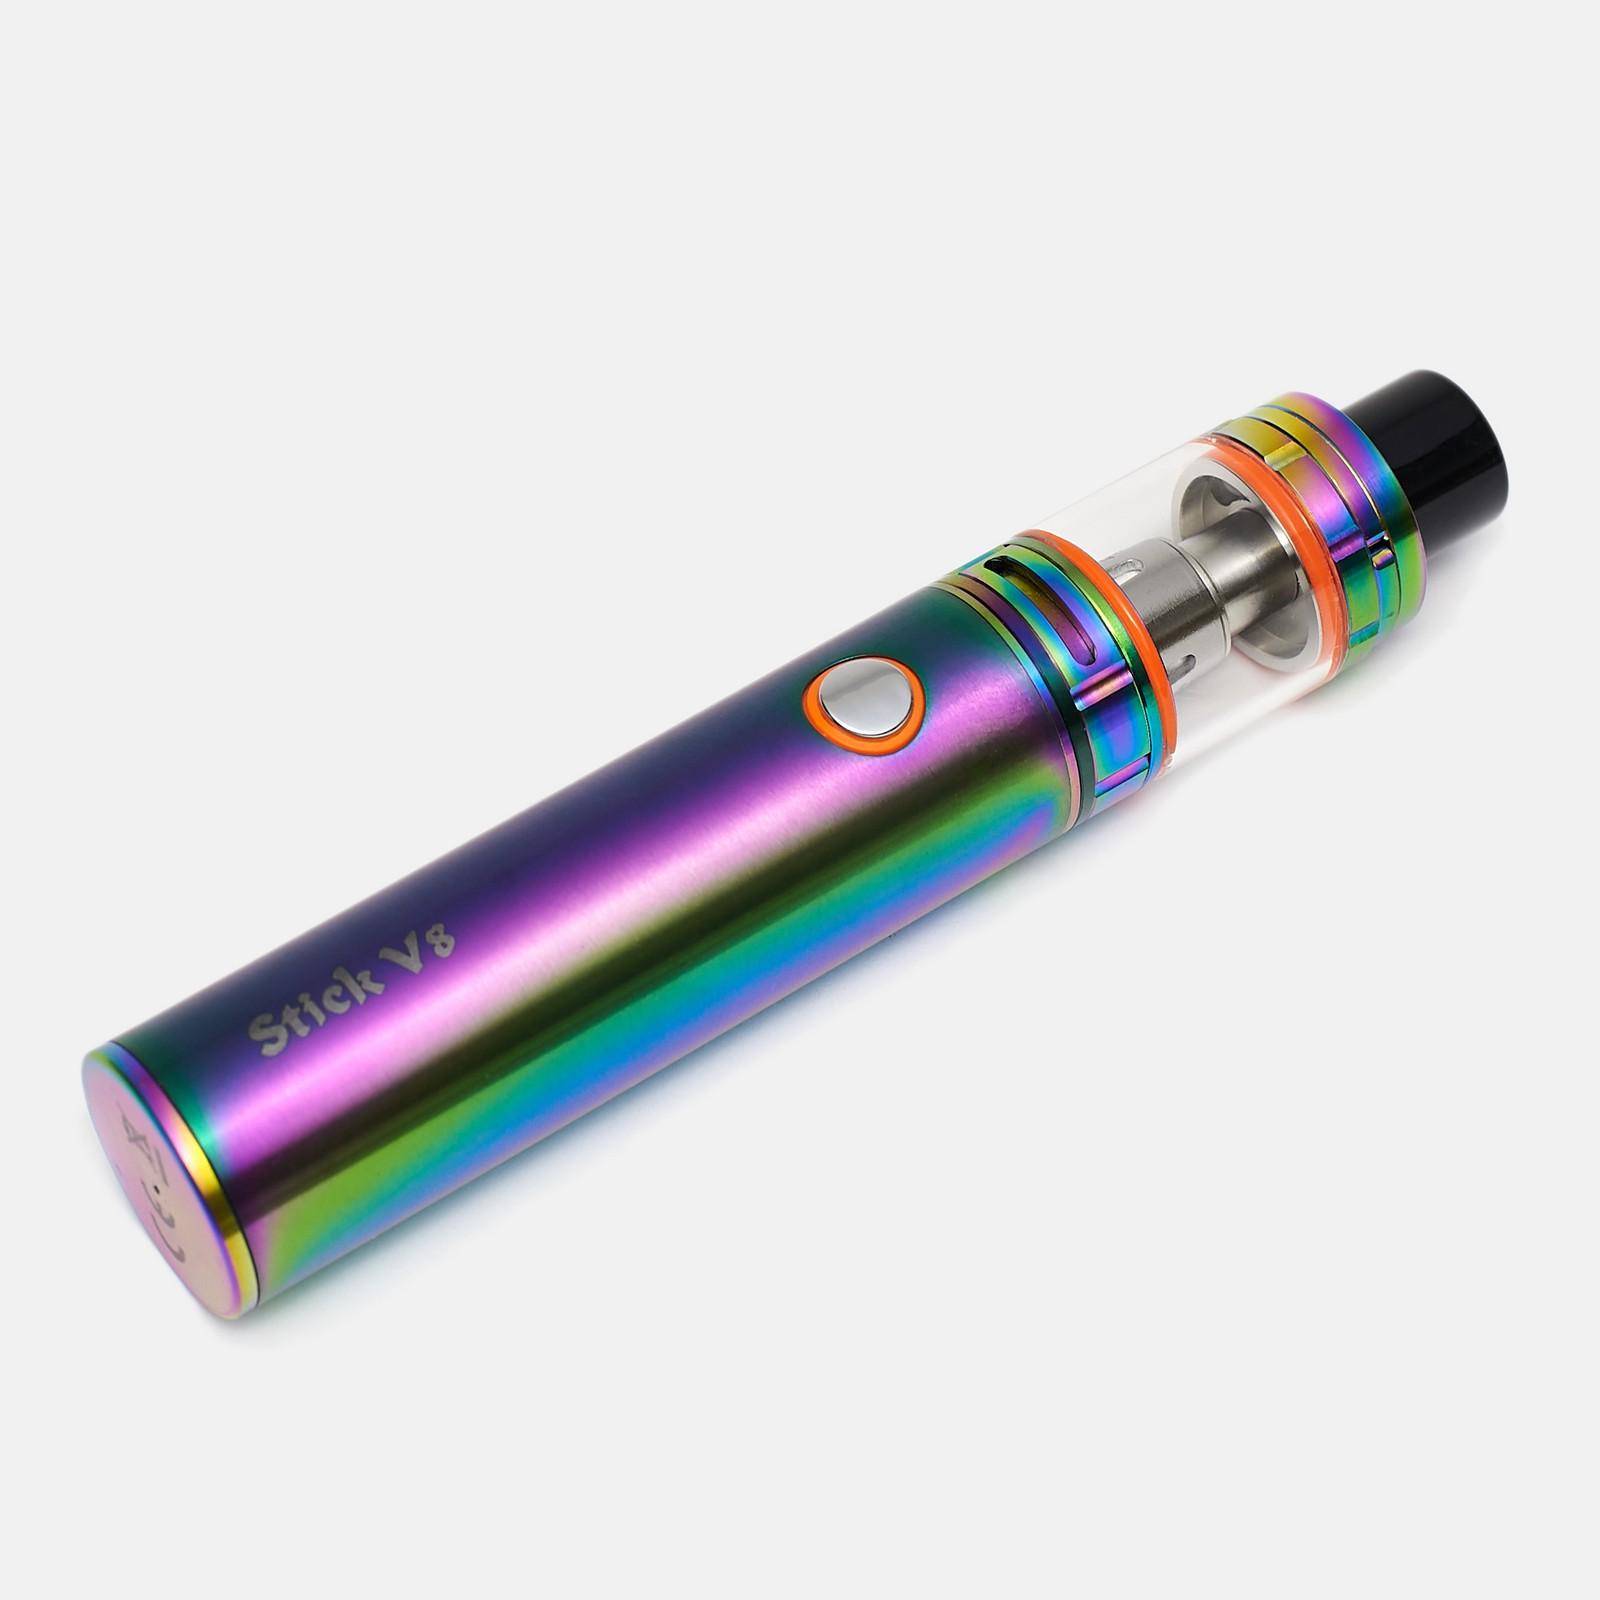 Cтартовый набор SMOK Stick V8 Rainbow